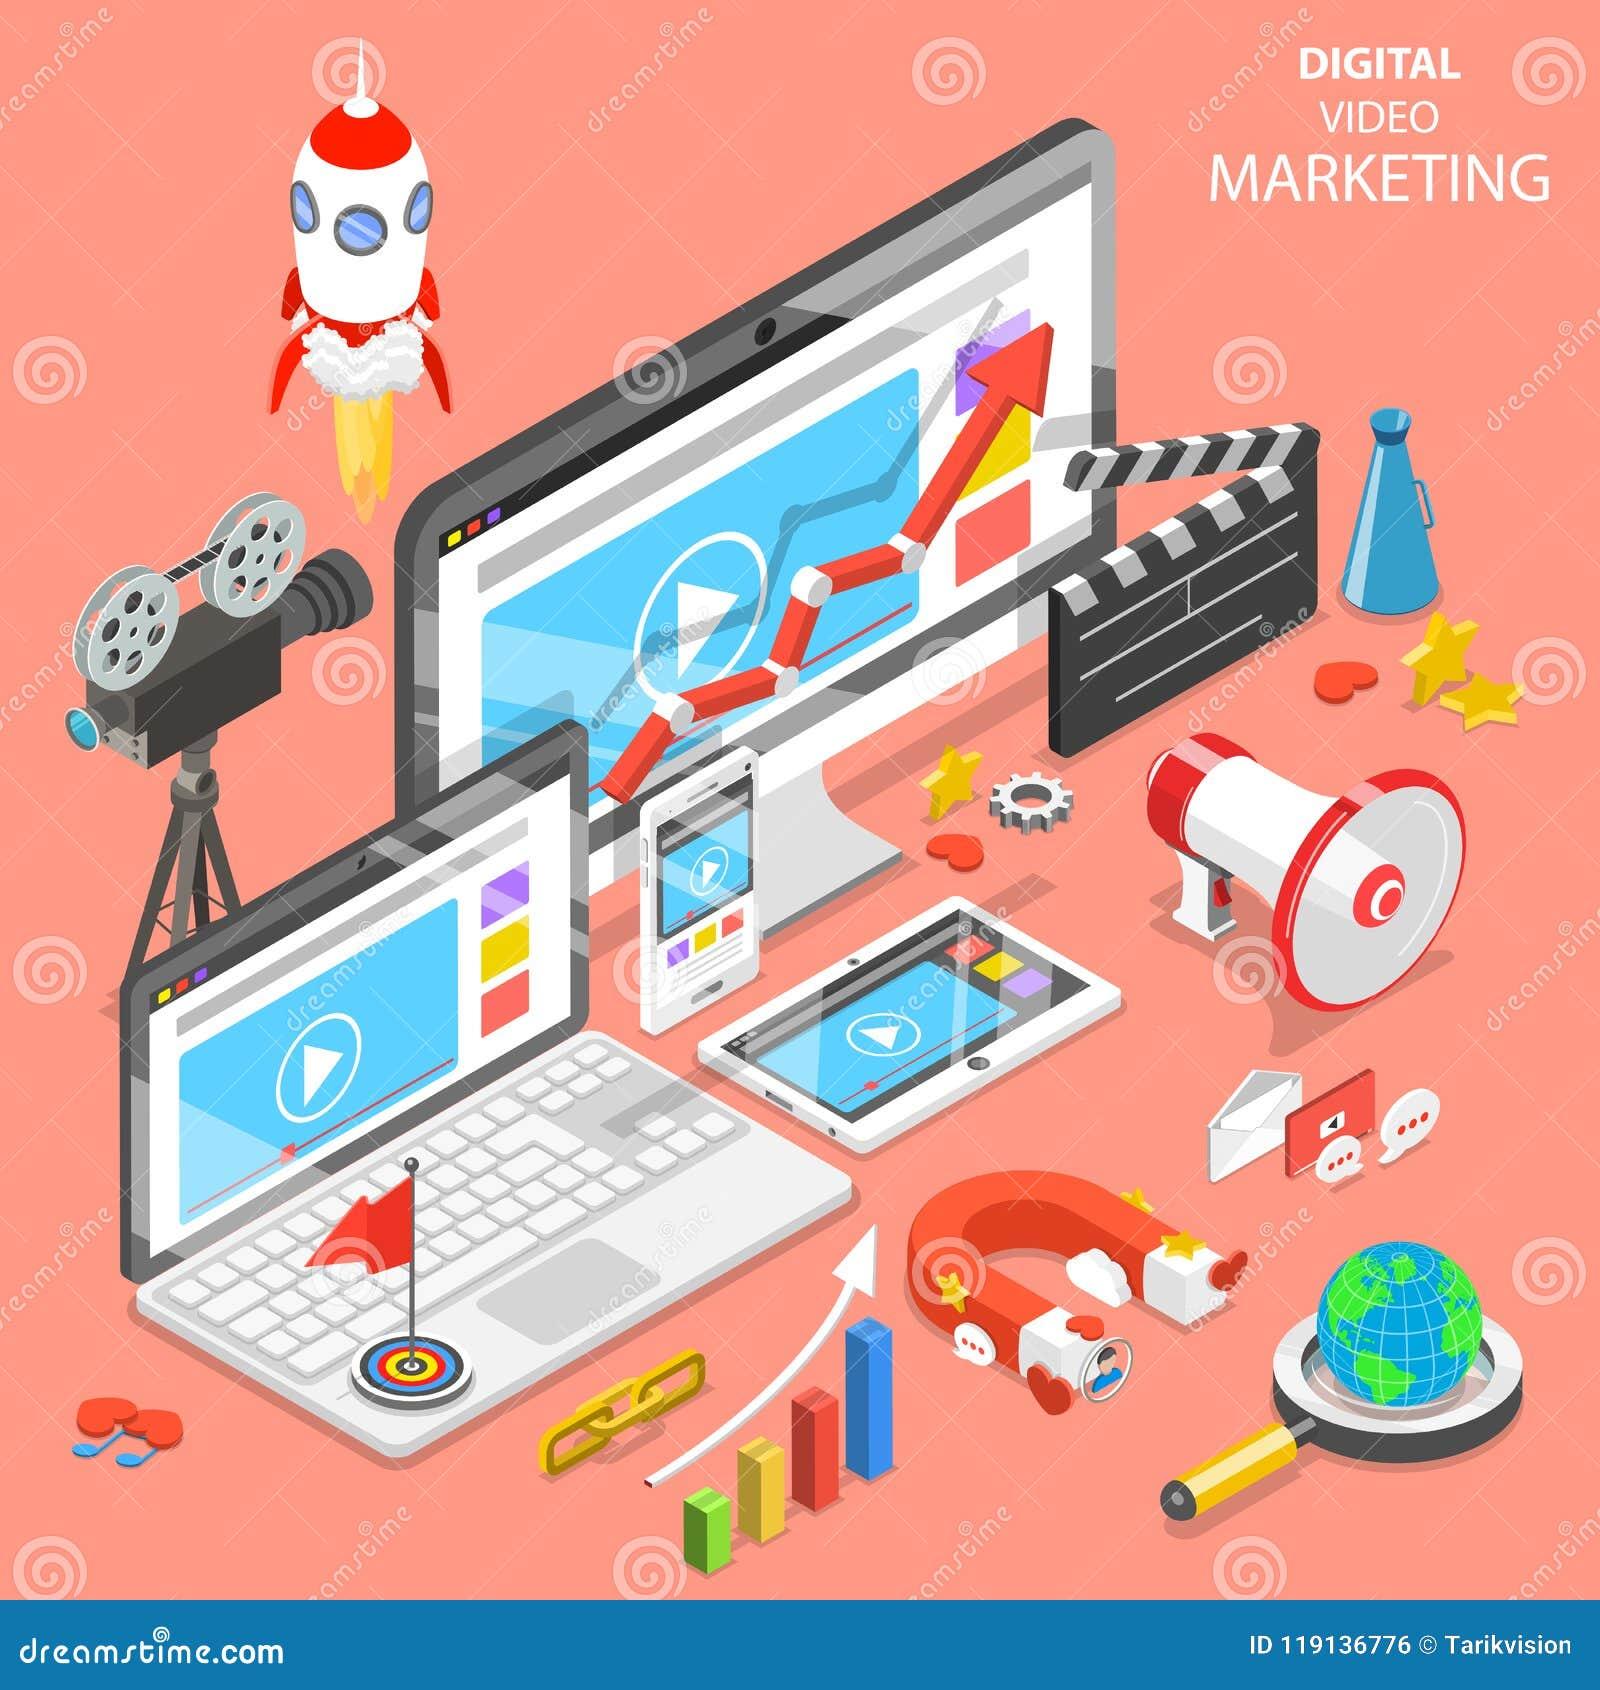 Digital video marketing flat isometric vector.